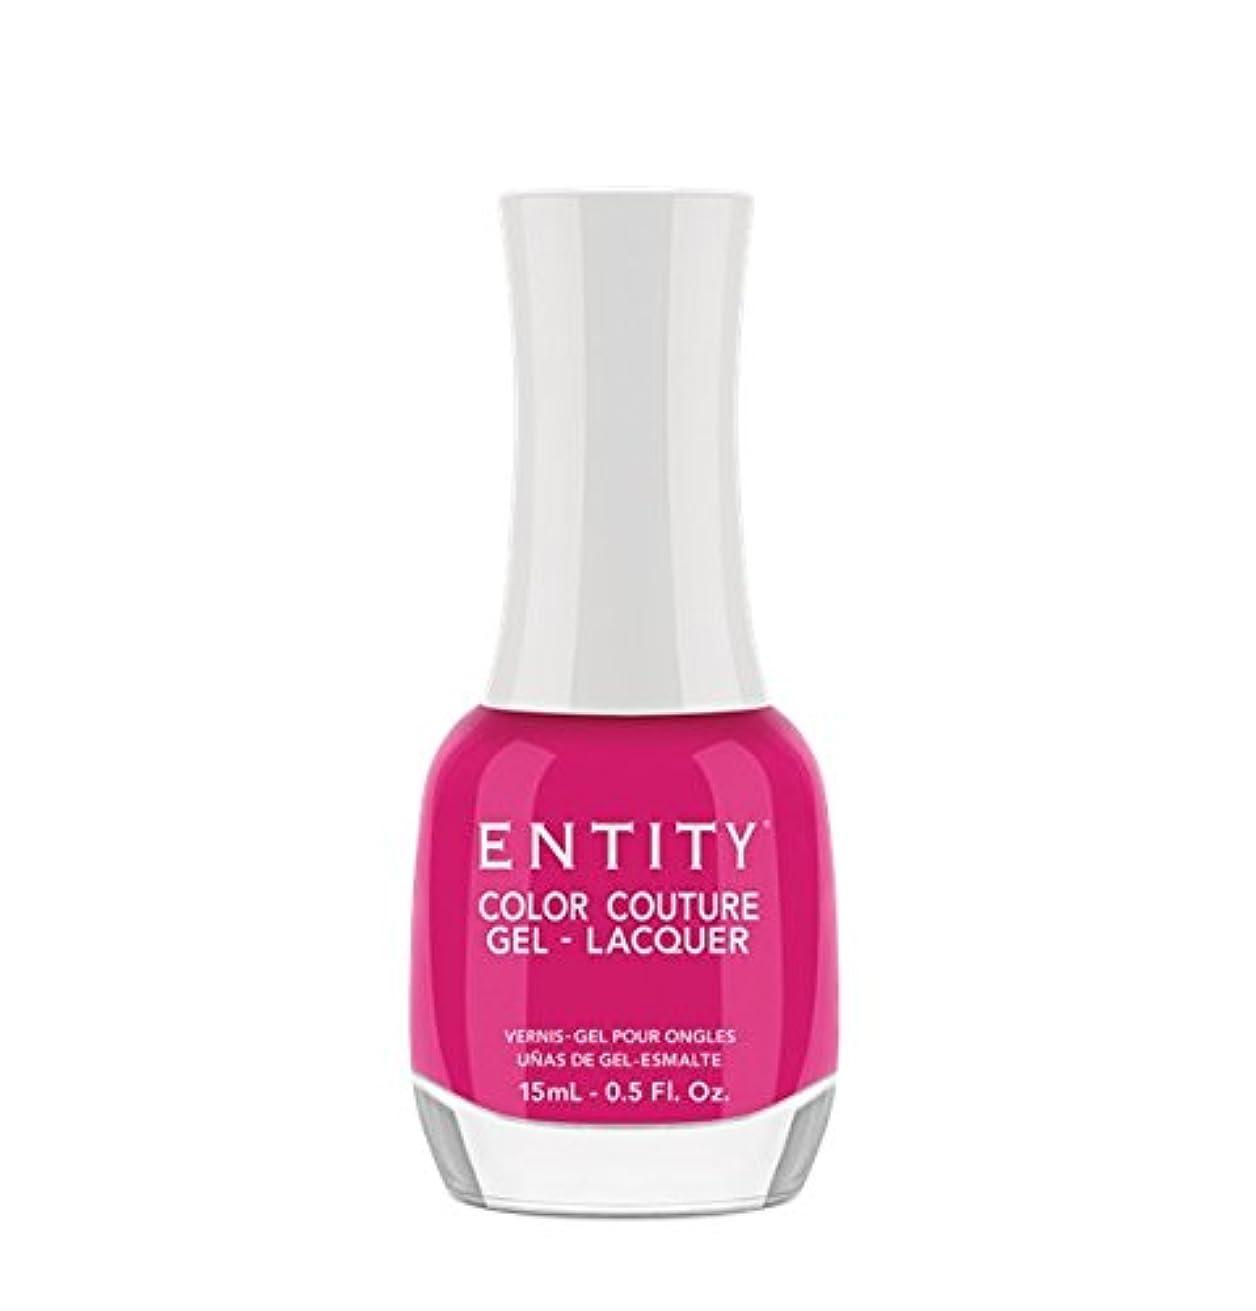 Entity Color Couture Gel-Lacquer - Tres Chic - 15 ml/0.5 oz